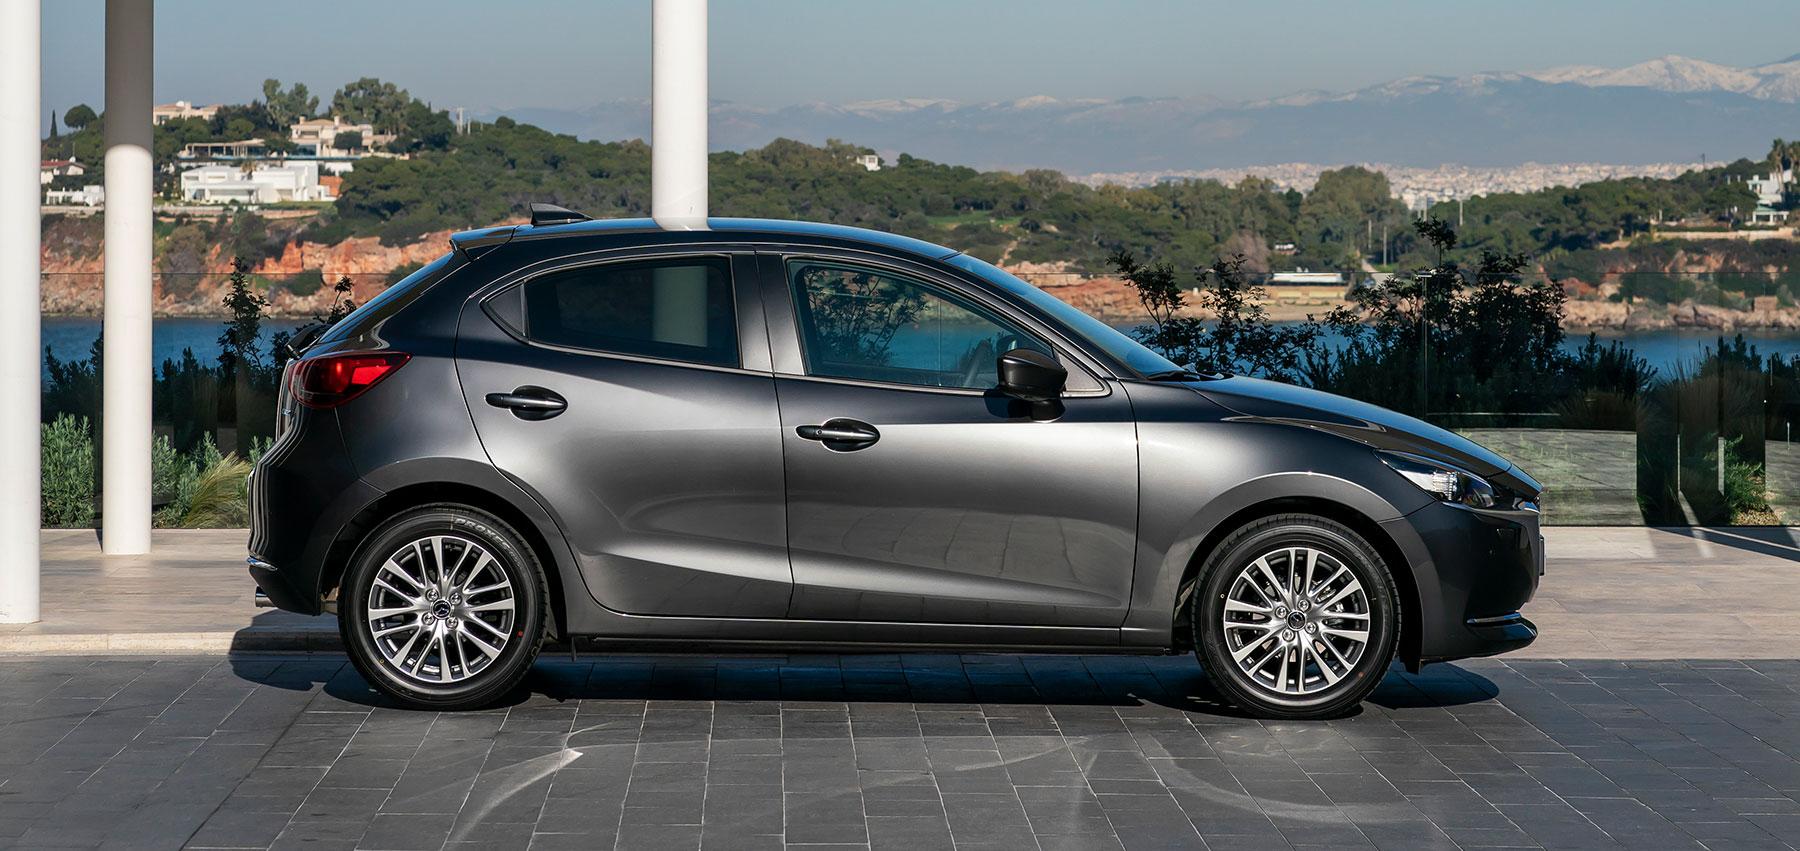 Kekurangan Mazda 2 2019 Spesifikasi